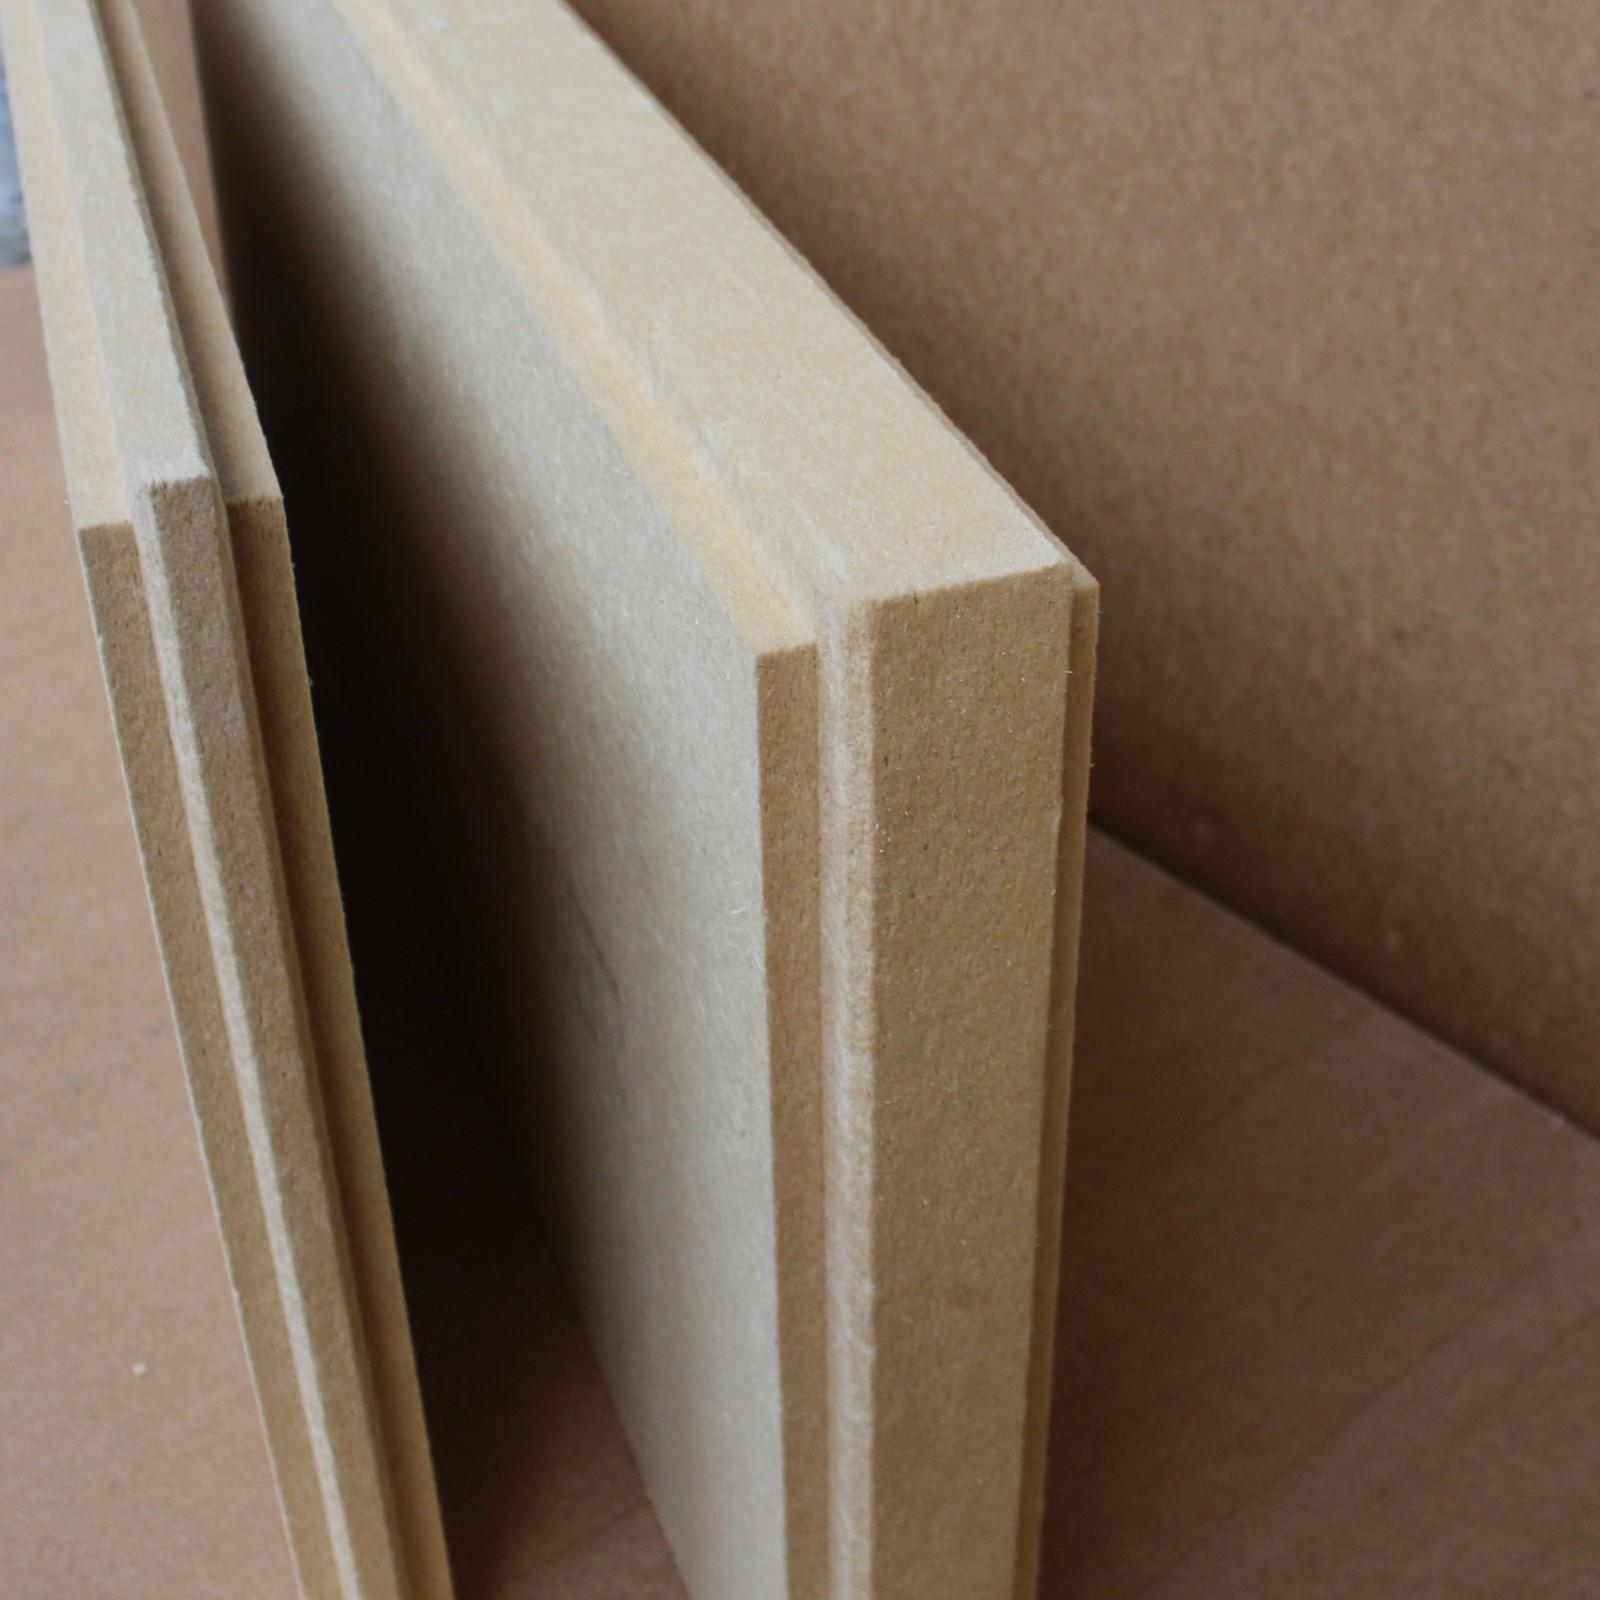 STEICO protect dry 60 mm 4-seitig Nut und Feder